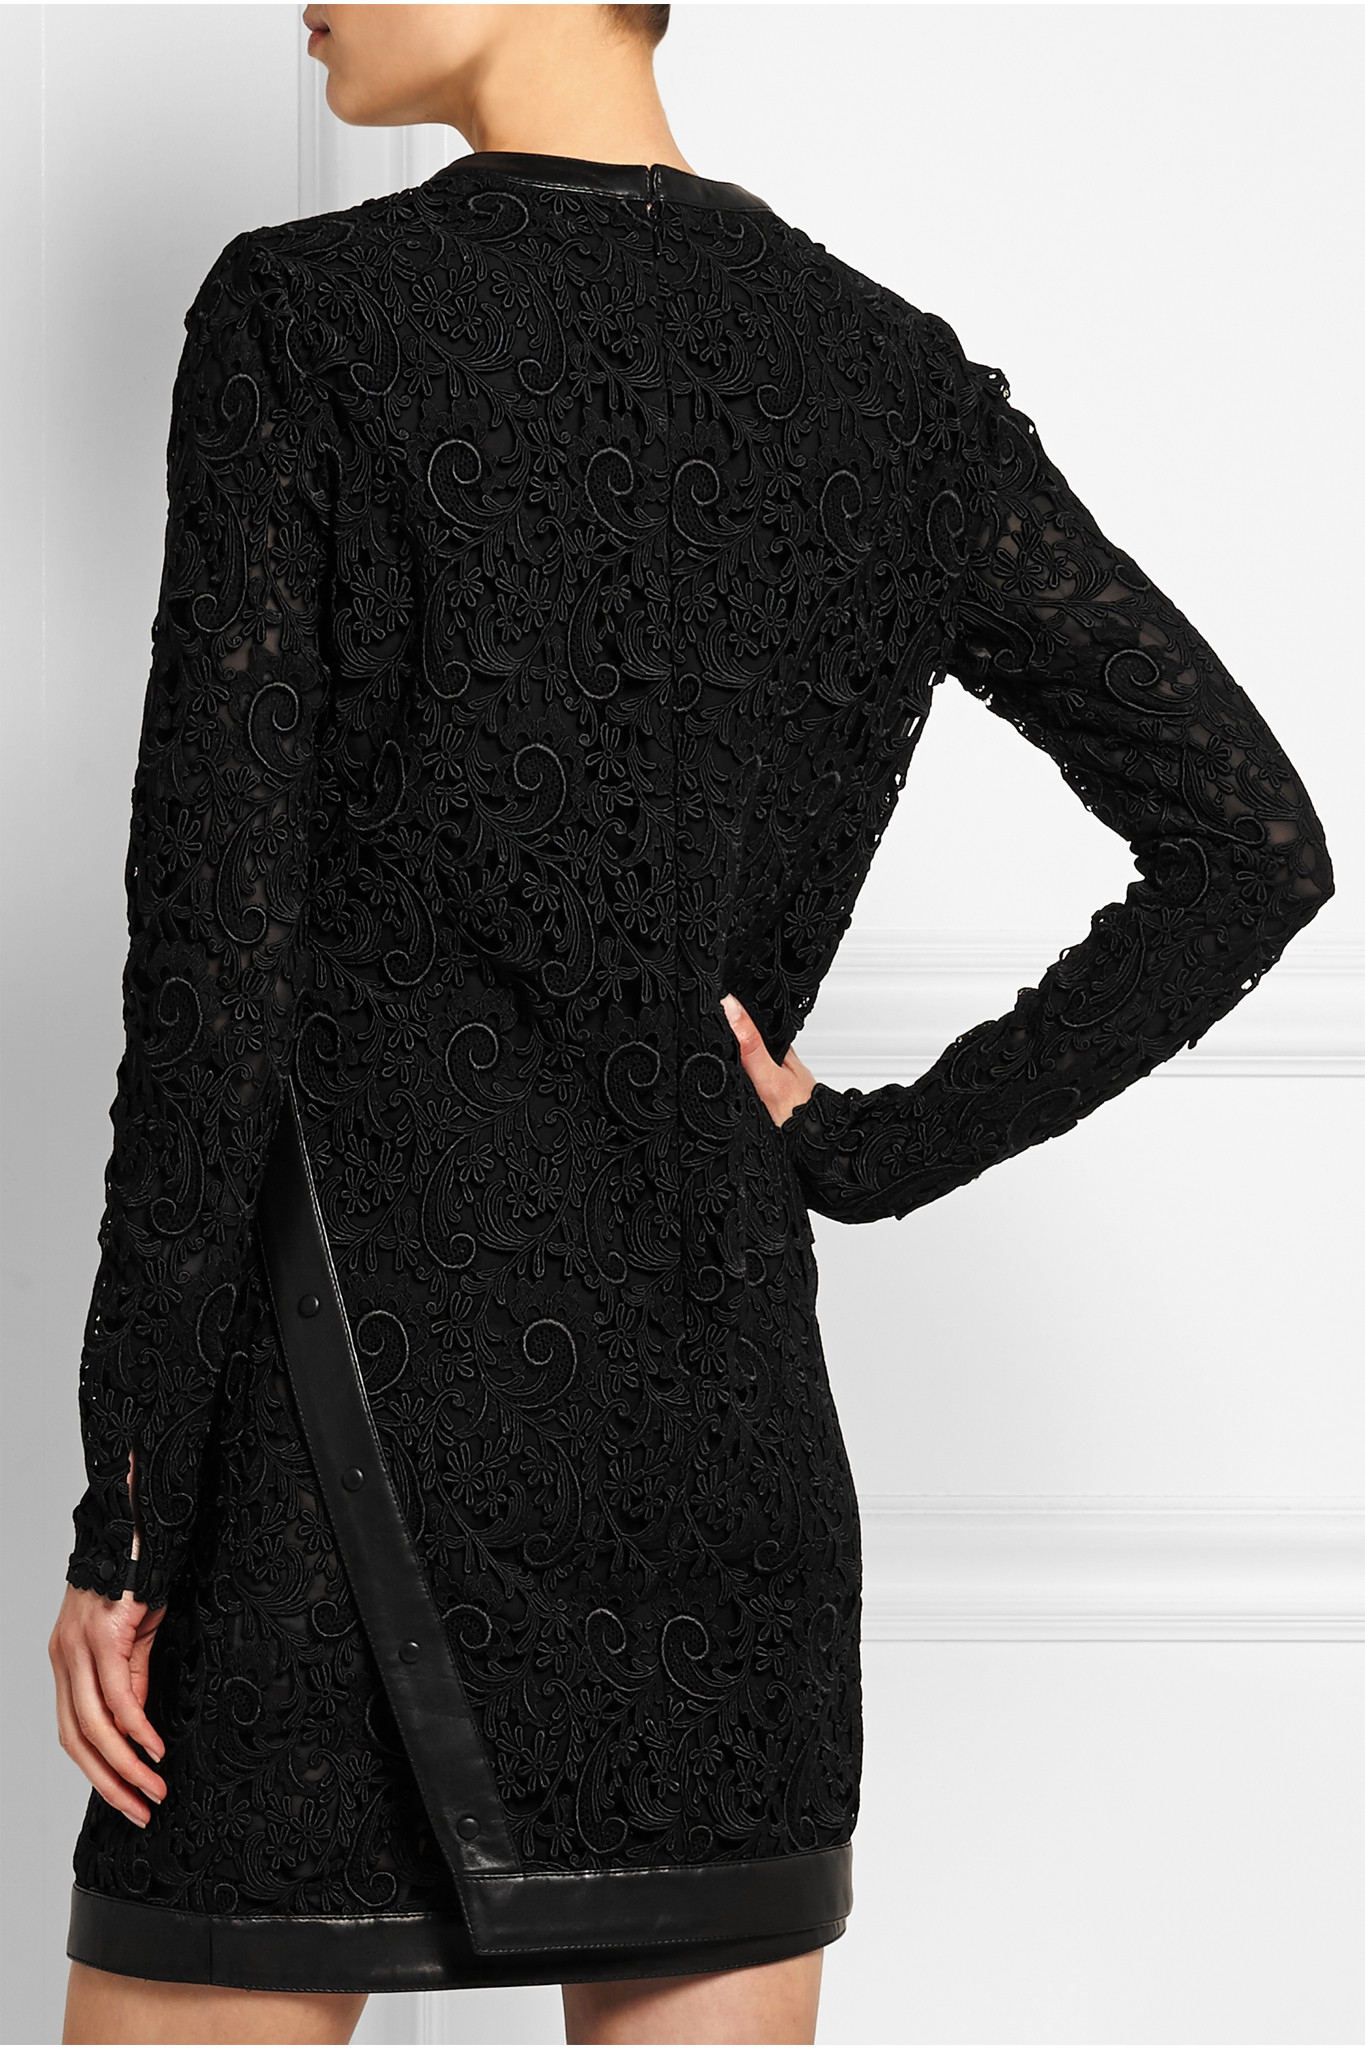 tom ford leather trimmed guipure lace mini dress in black. Black Bedroom Furniture Sets. Home Design Ideas